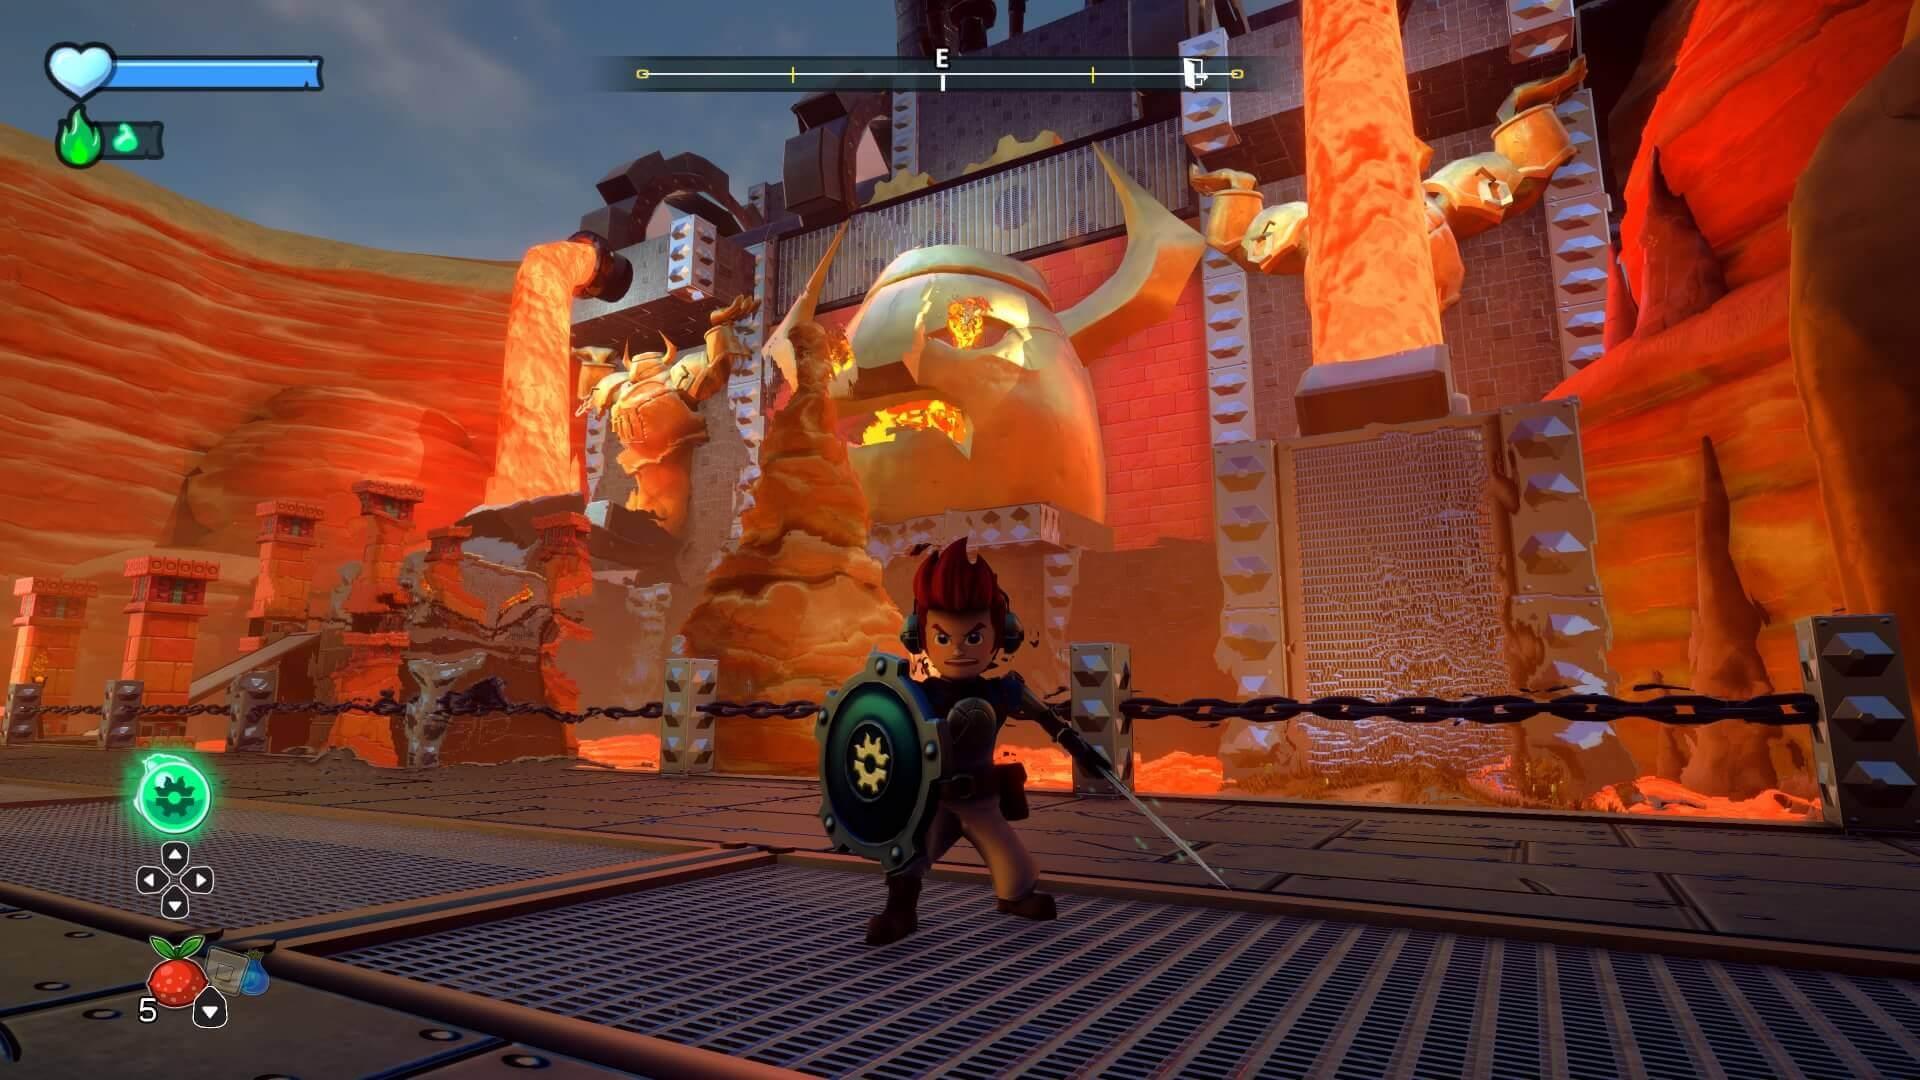 Análise A Knight's Quest, A Knight's Quest, Sky 9 Games, Curve Digital, Delfos